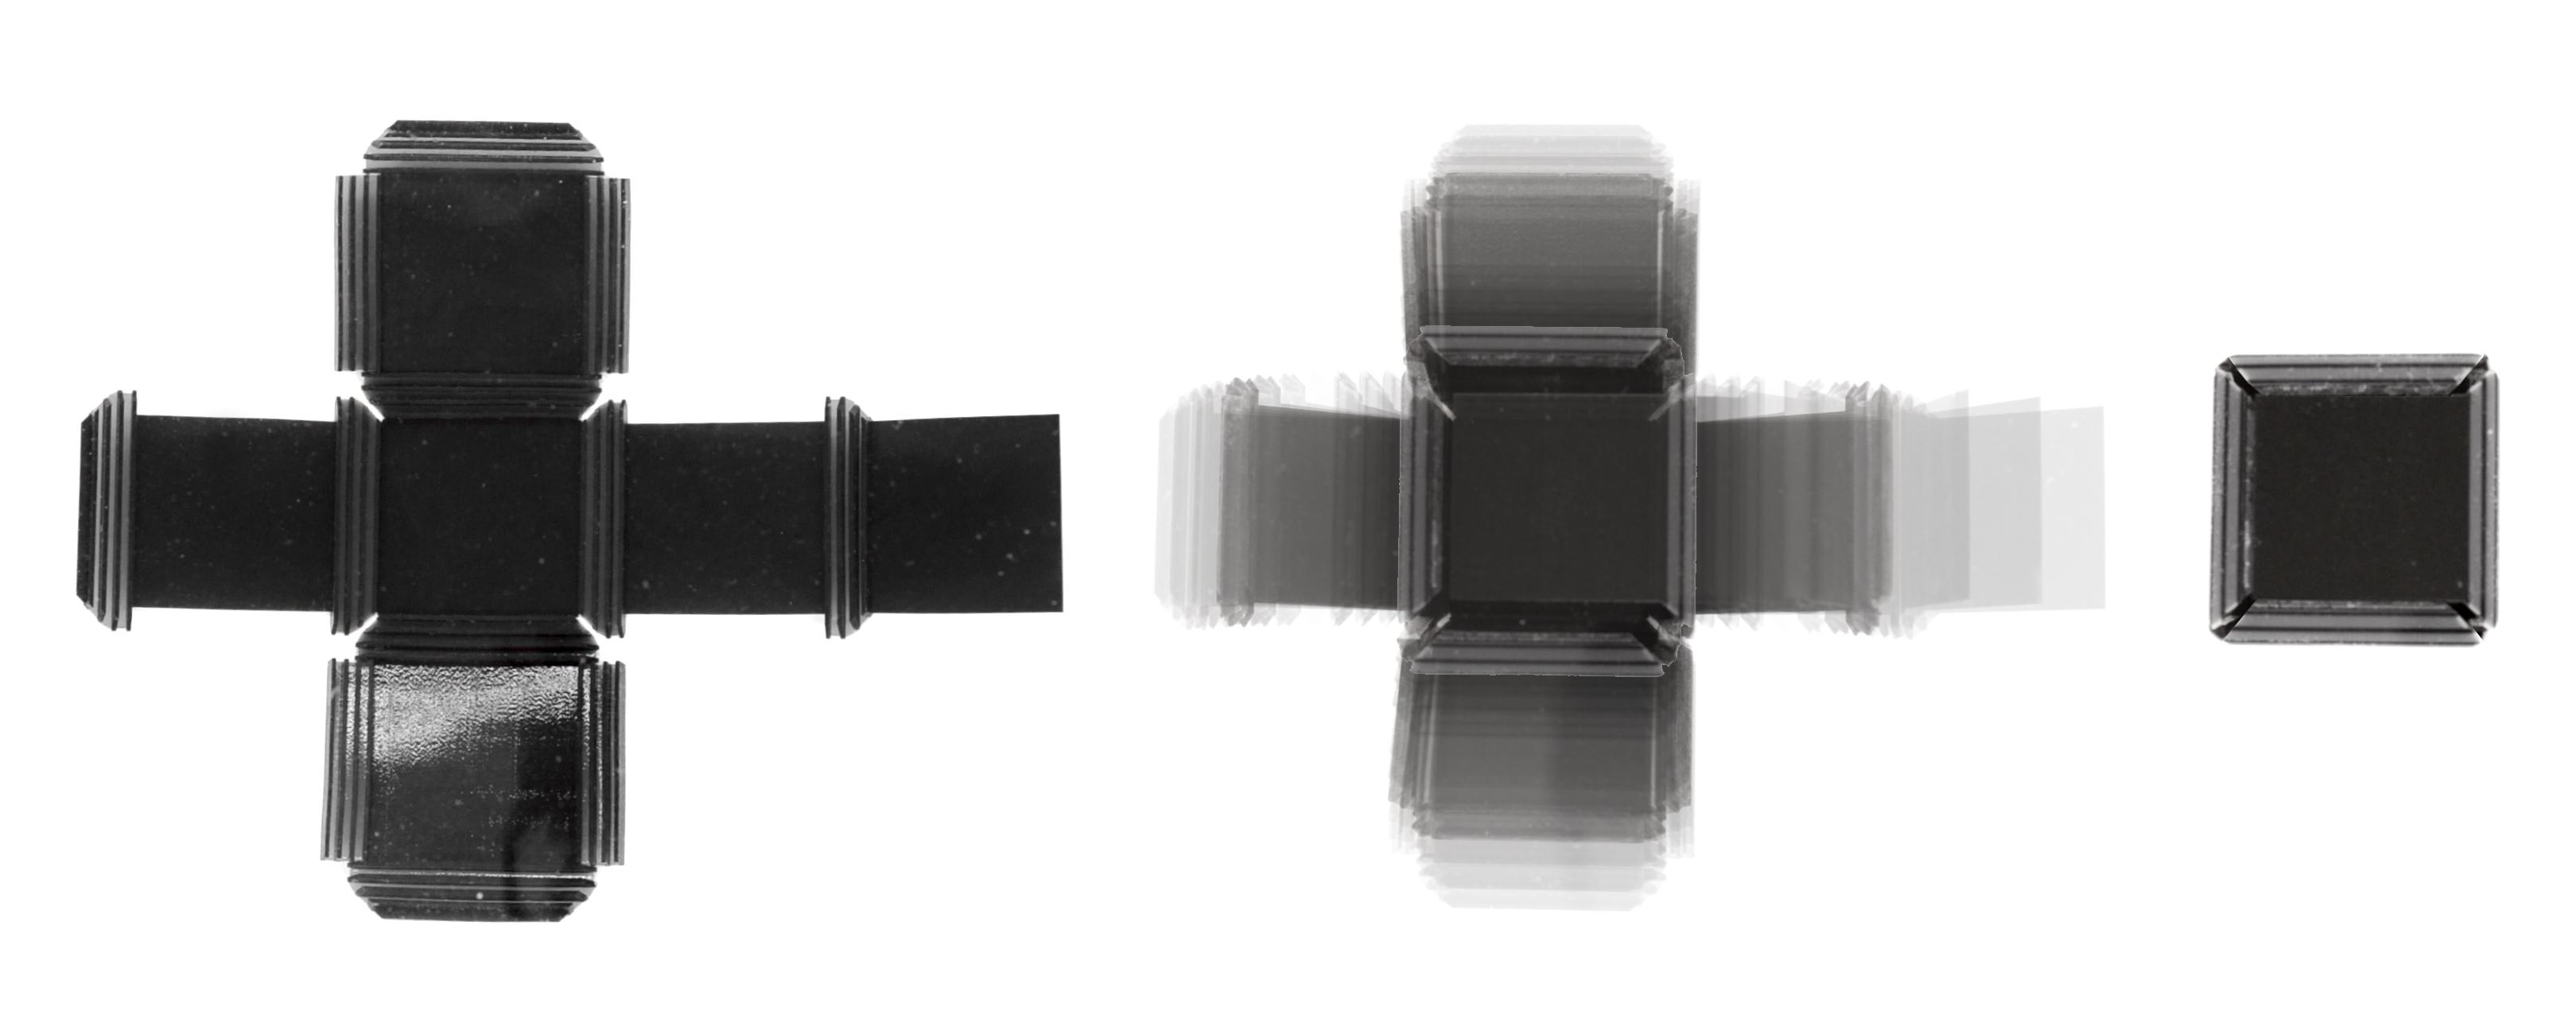 Rurah Soft SLR Camera Strap Retro Camera Wrist Strap Self Locking Micro Single Camera Wristband Round Hole Photographed Hand Rope,Black